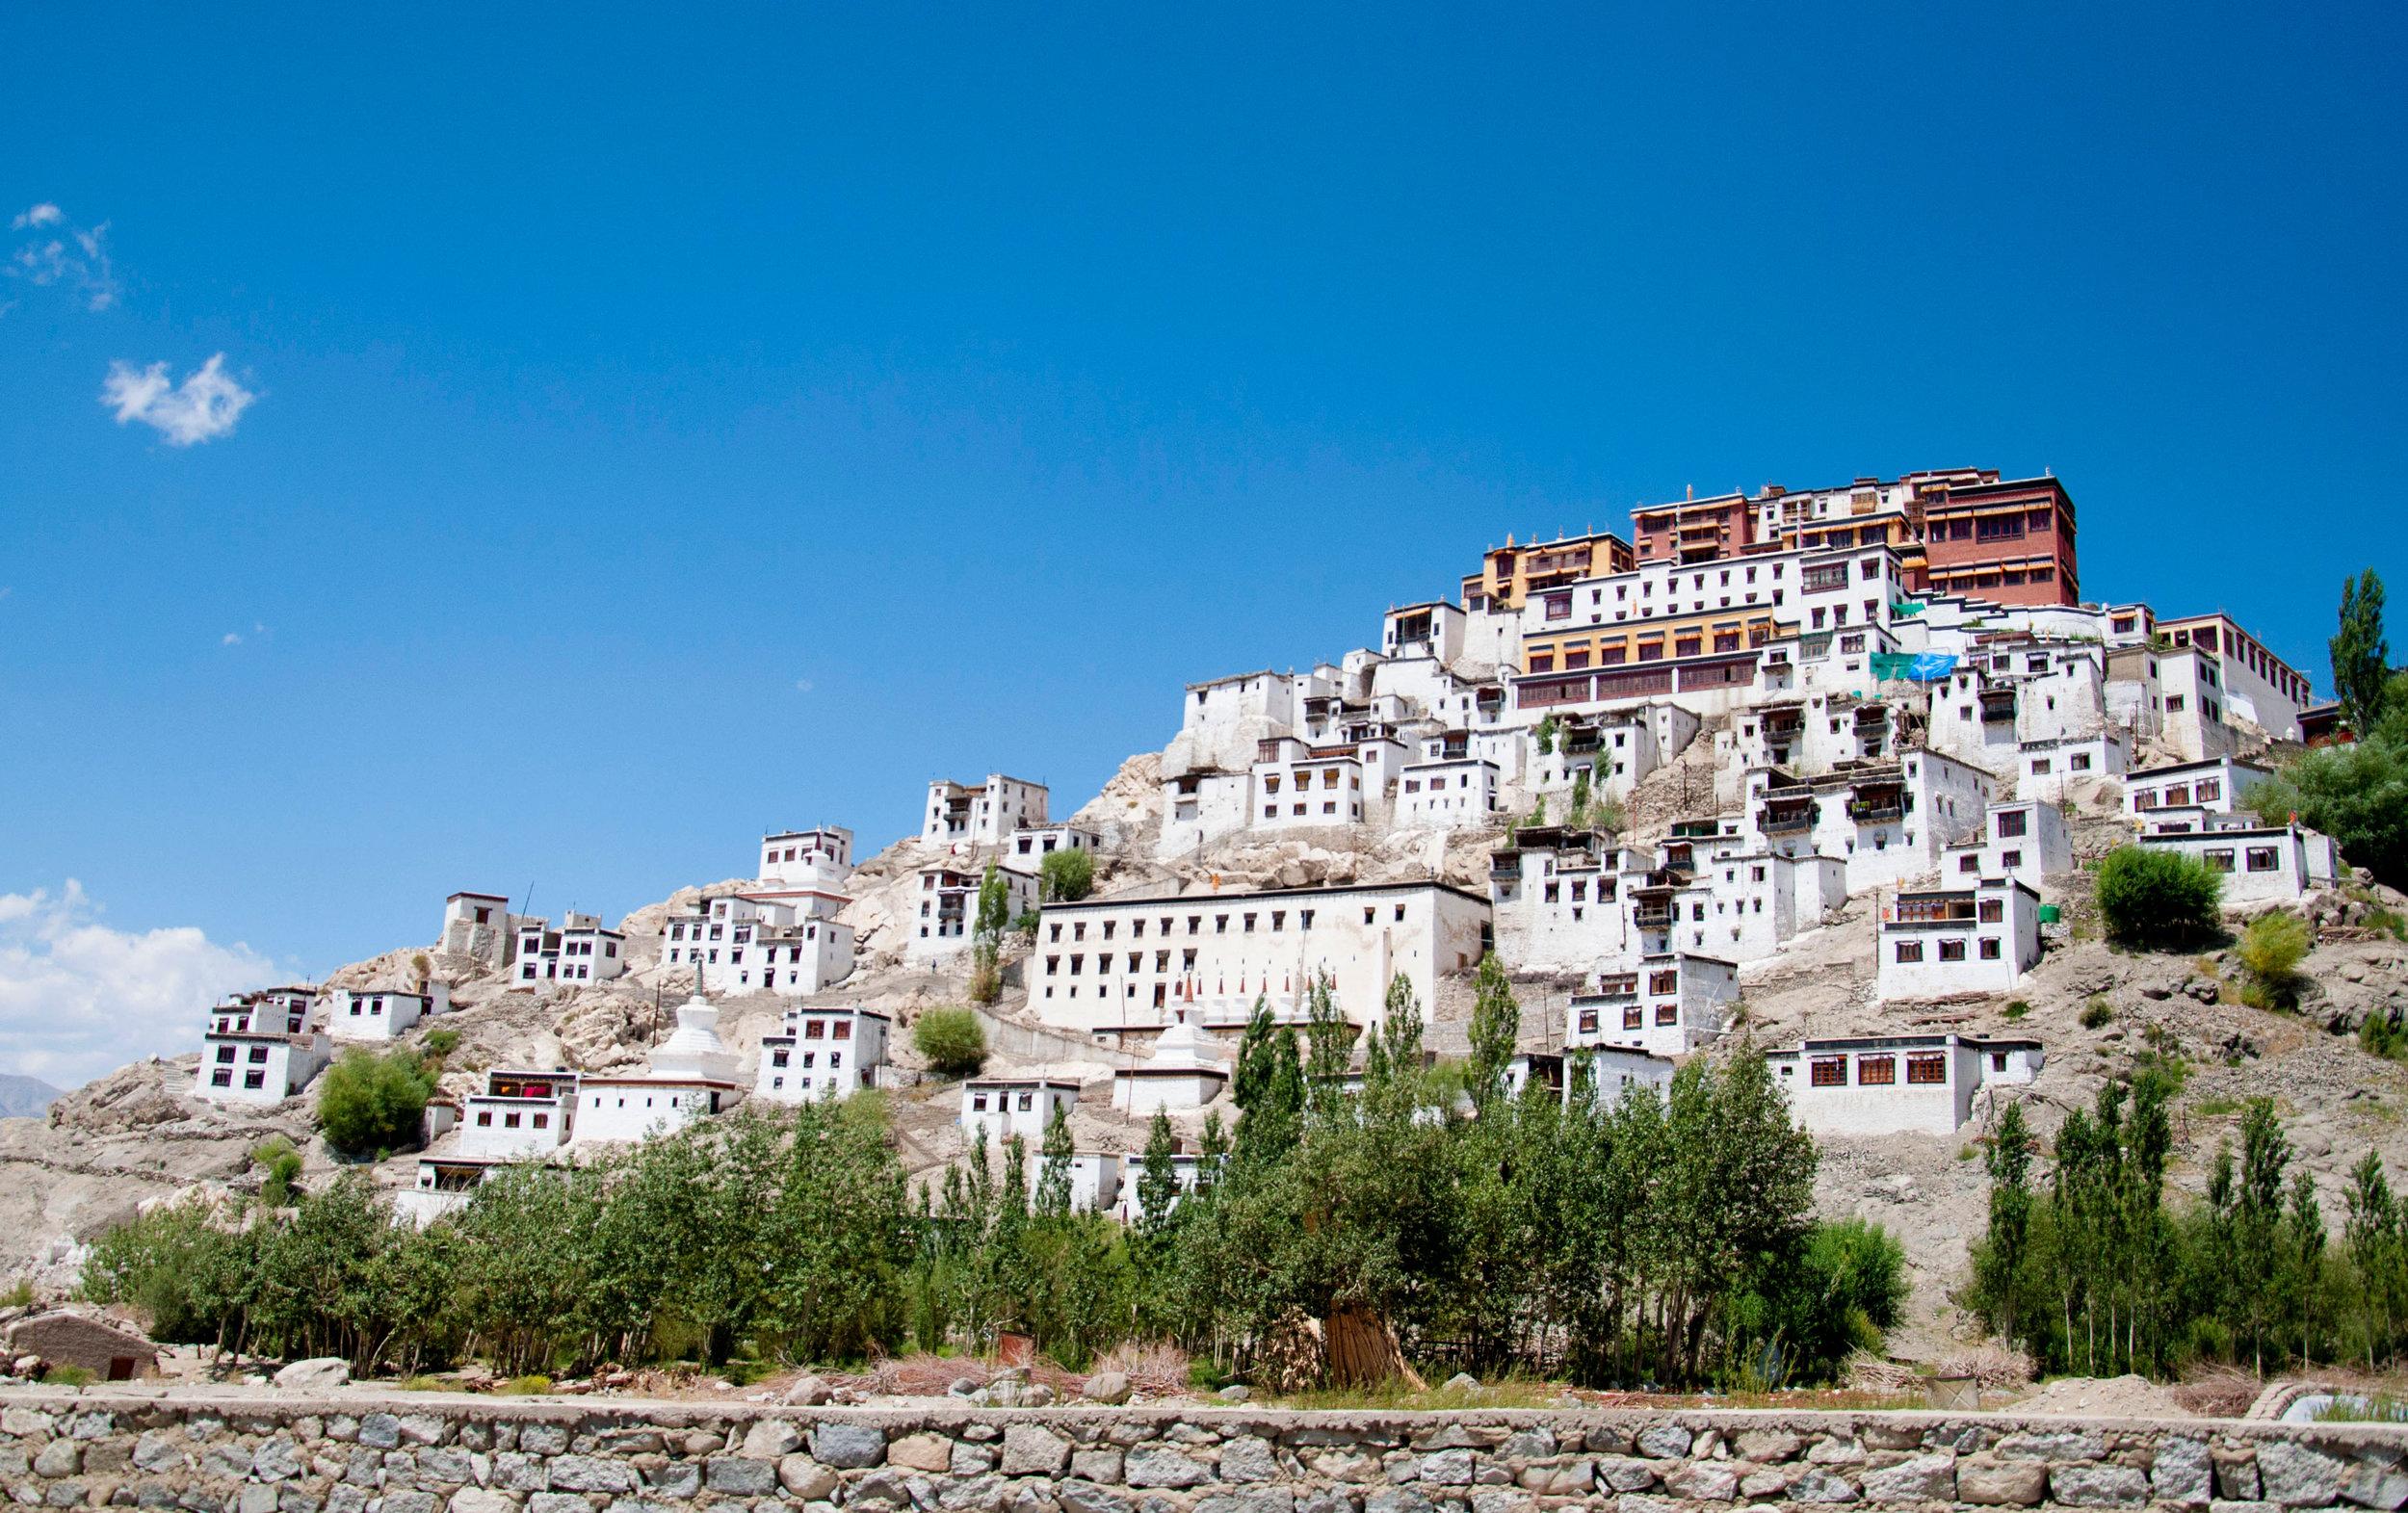 India - livets reise venter i indiske Himalaya og Ladakh